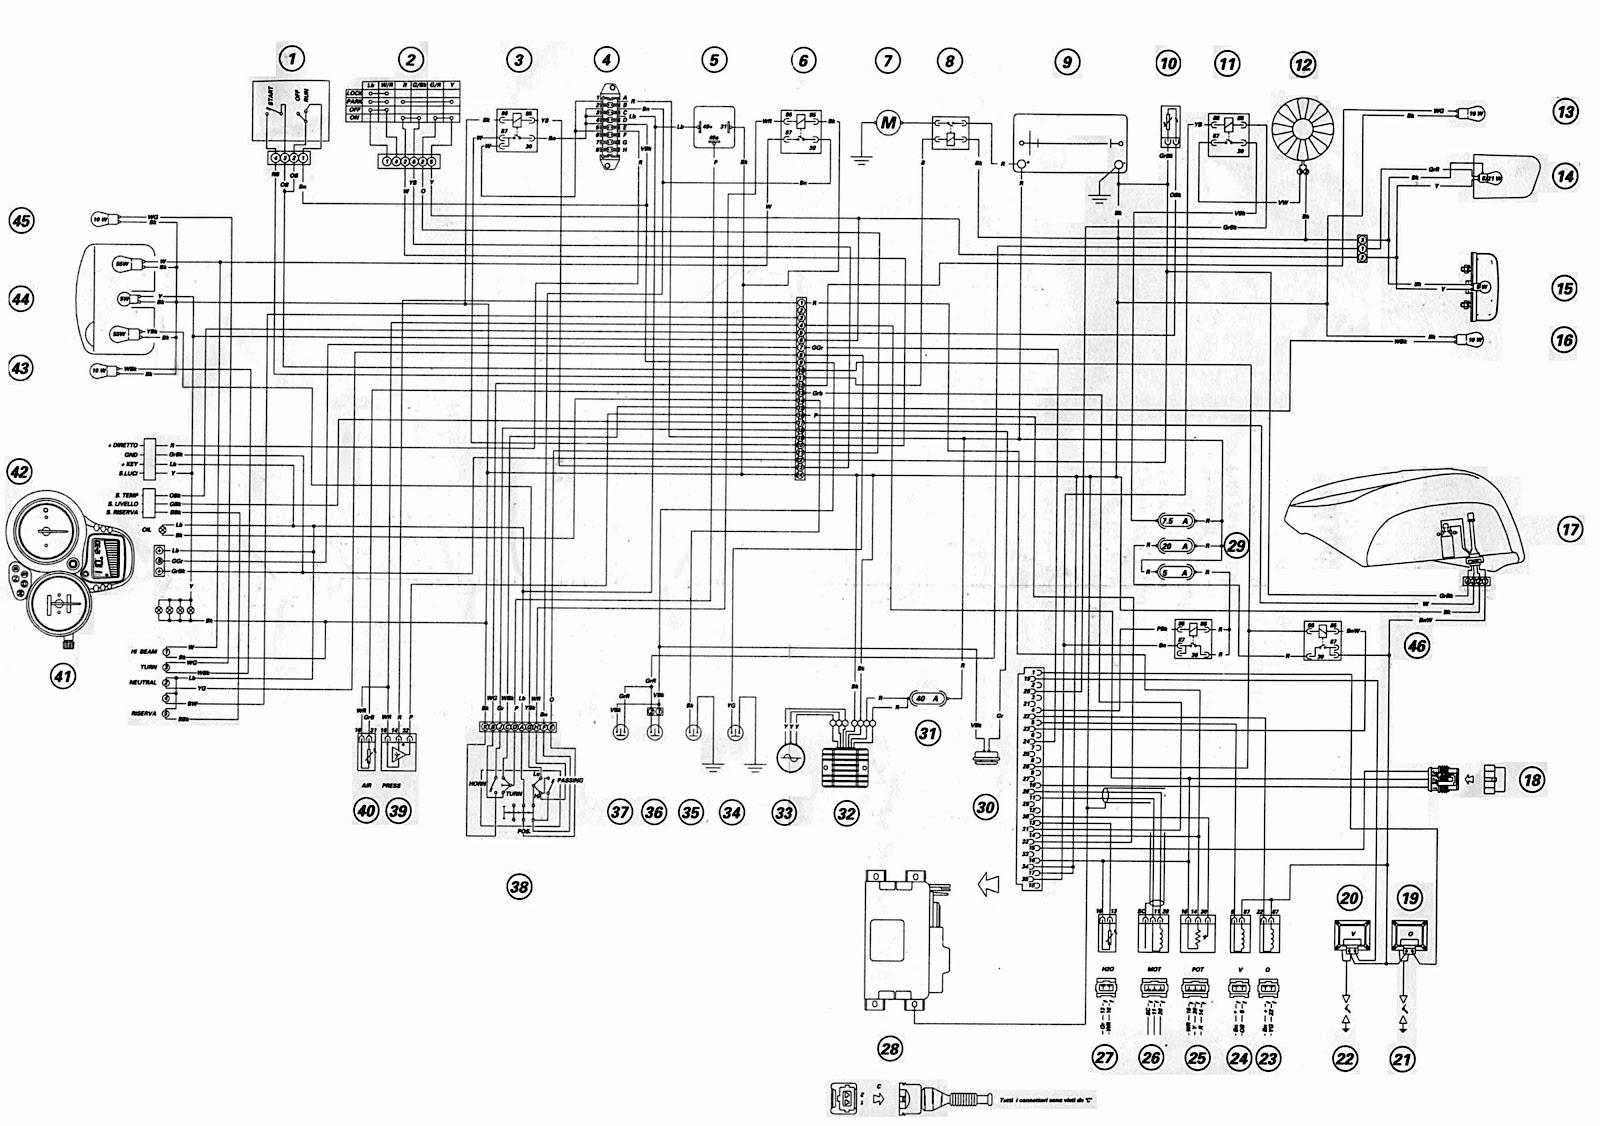 MA_0802] Ducati Wiring SchematicsAnimo Hyedi Vell Vira Mohammedshrine Librar Wiring 101